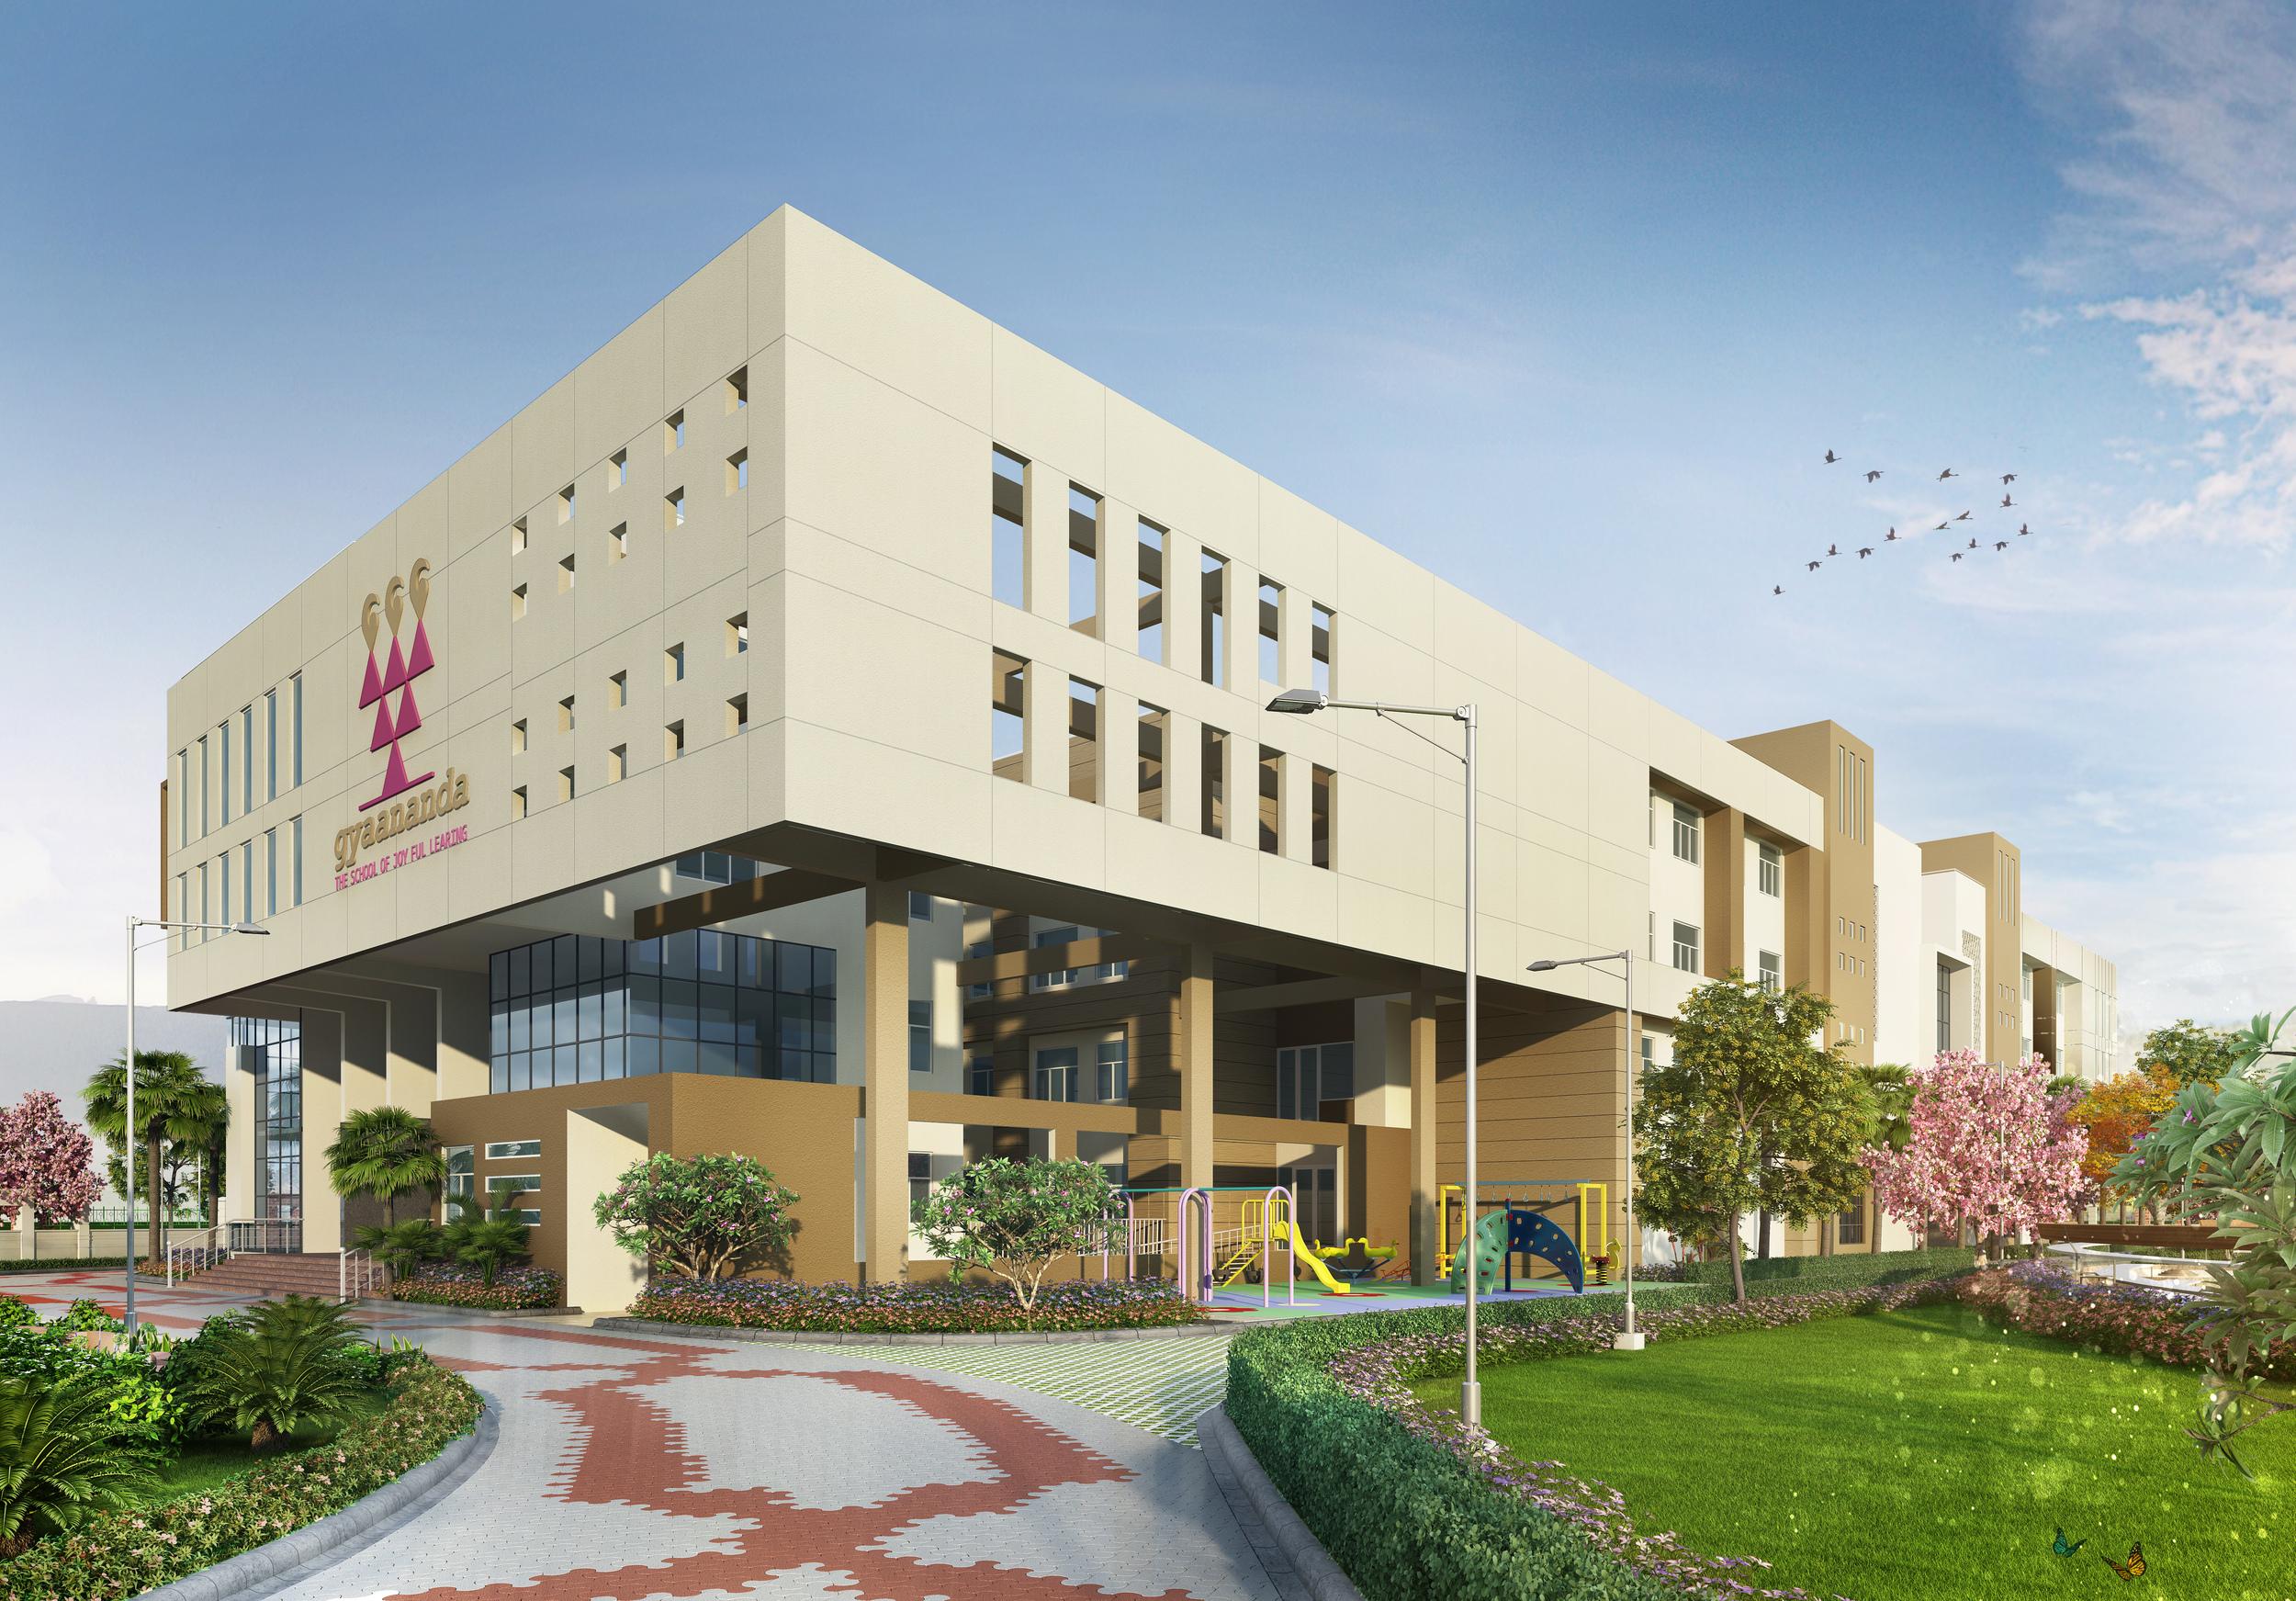 Gyananda School, Gurgaon